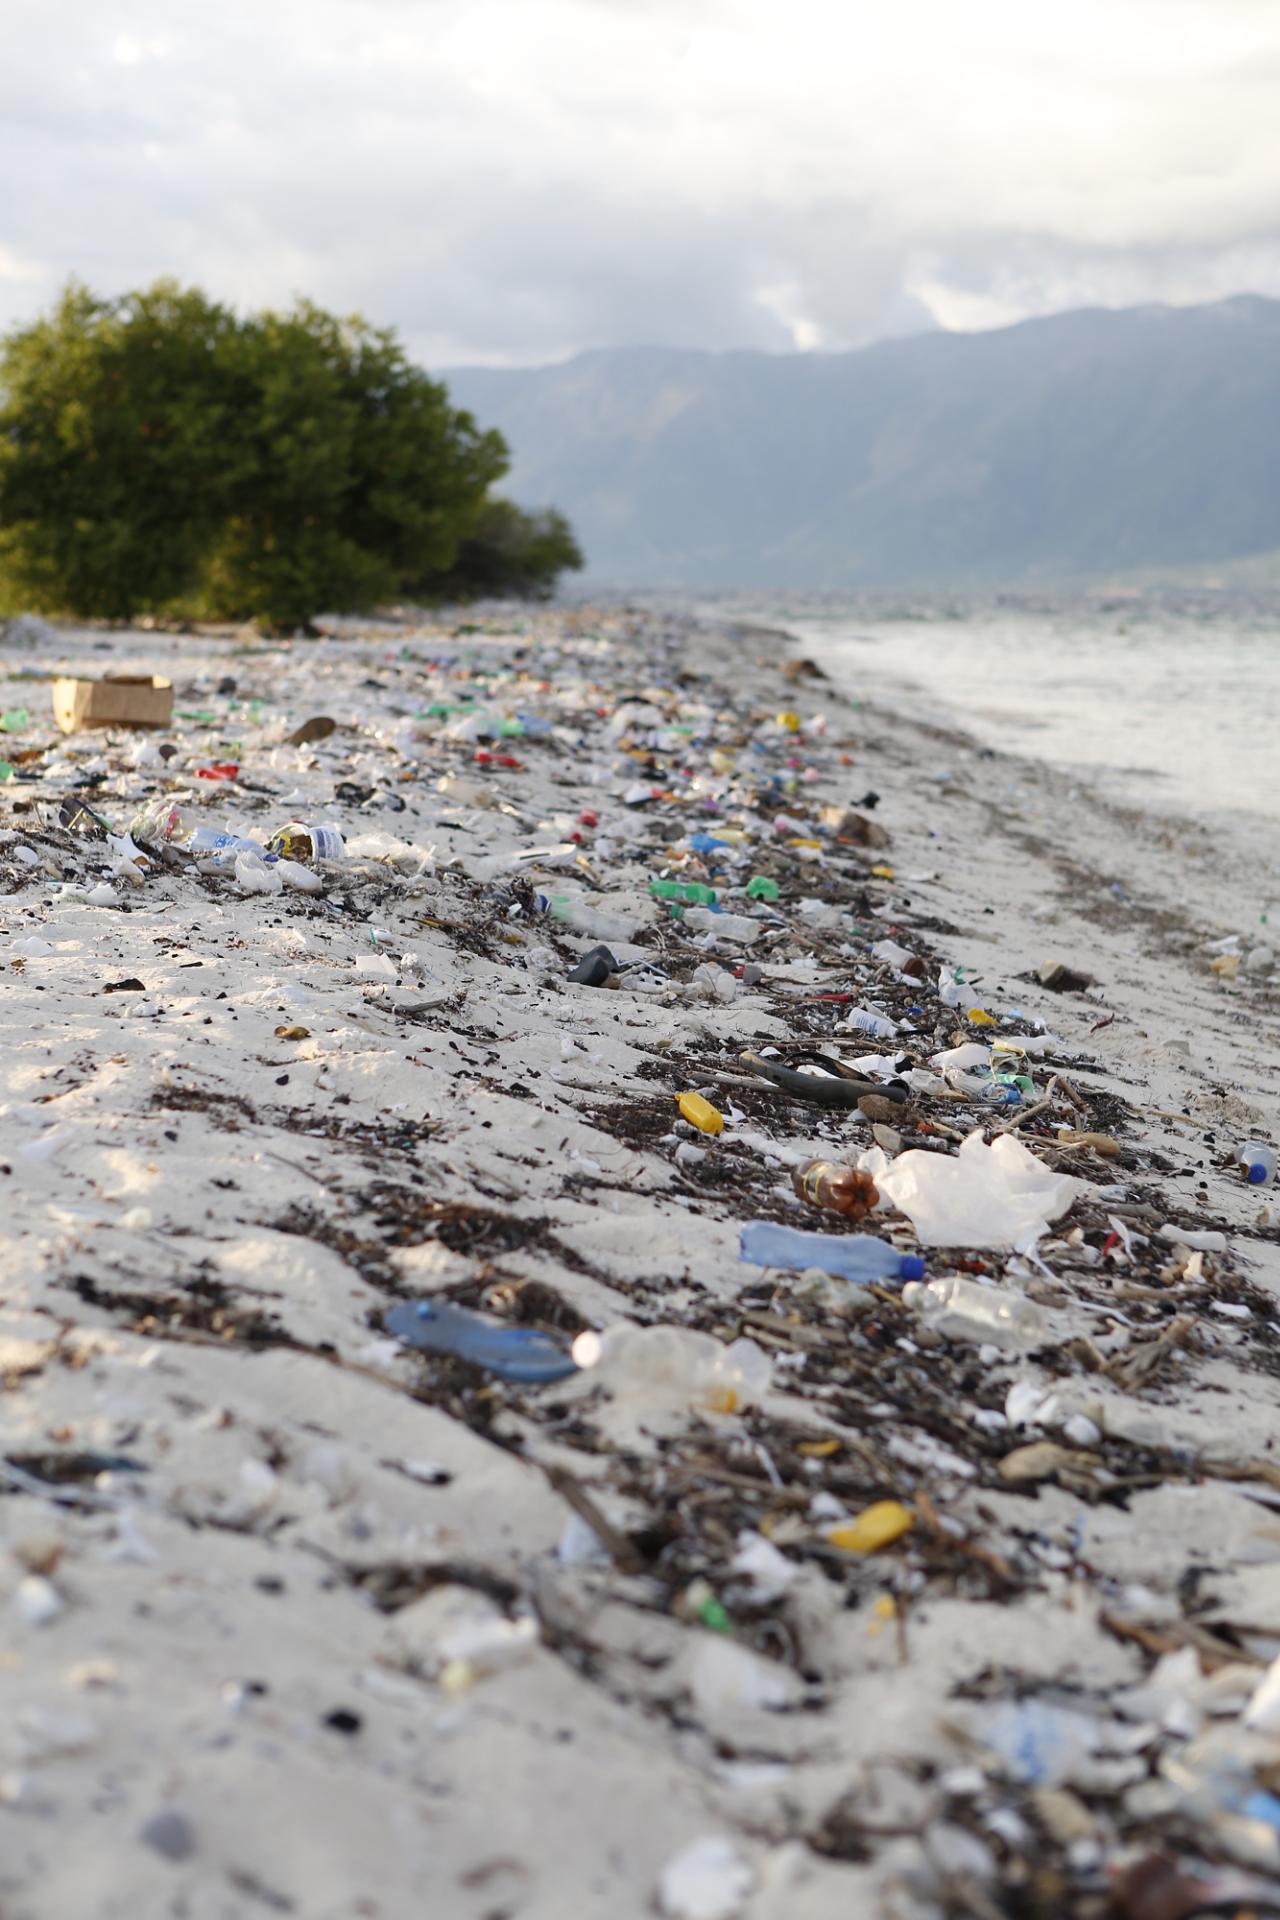 Plastic garbage piles up on Haiti's beaches.